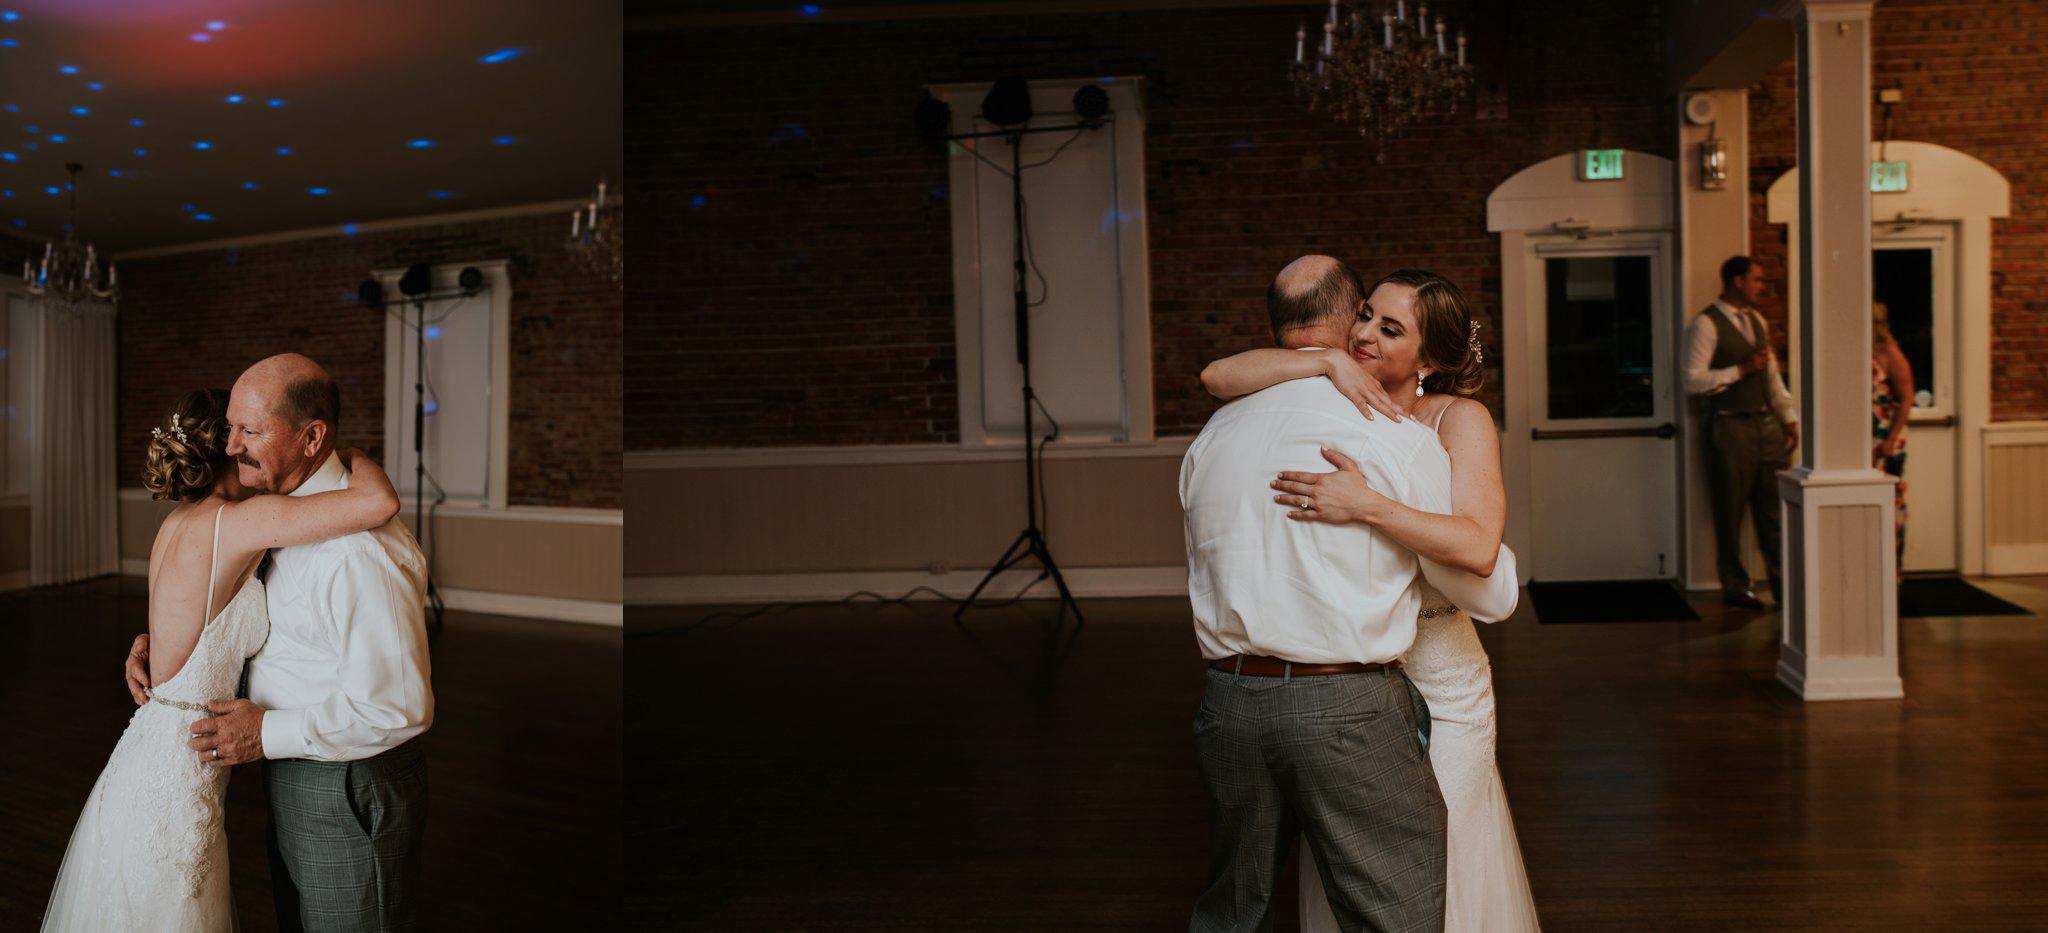 hollywood-school-house-wedding-seattle-photographer-caitlyn-nikula-114.jpg